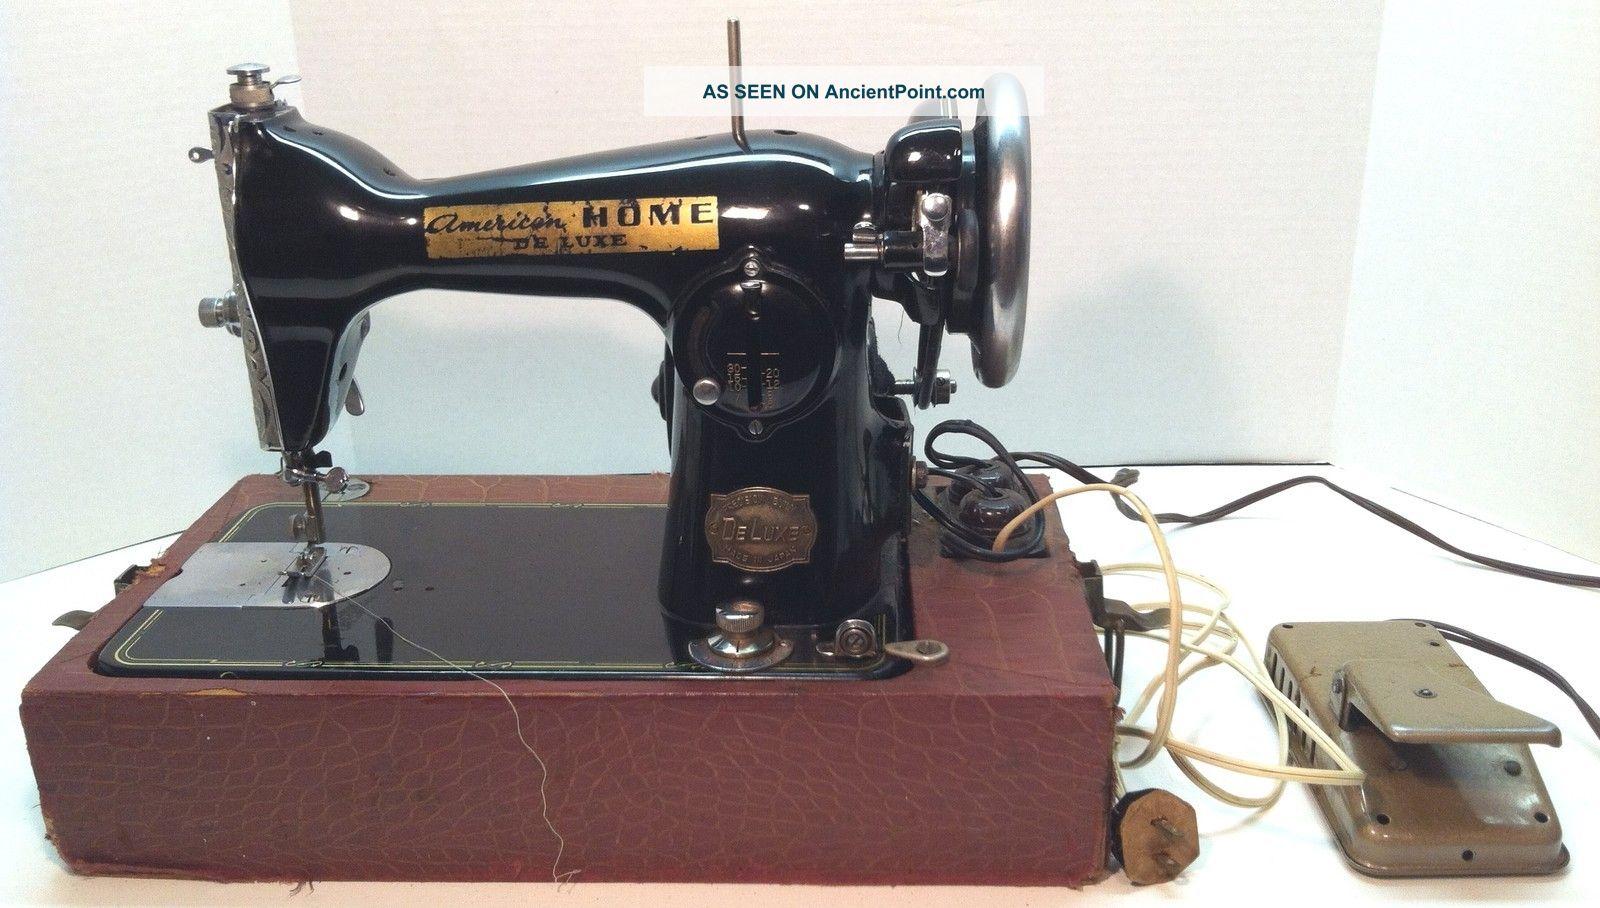 Antique American Home De Luxe Sewing Machine Precision Built De Luxe Japan Sewing Machines photo